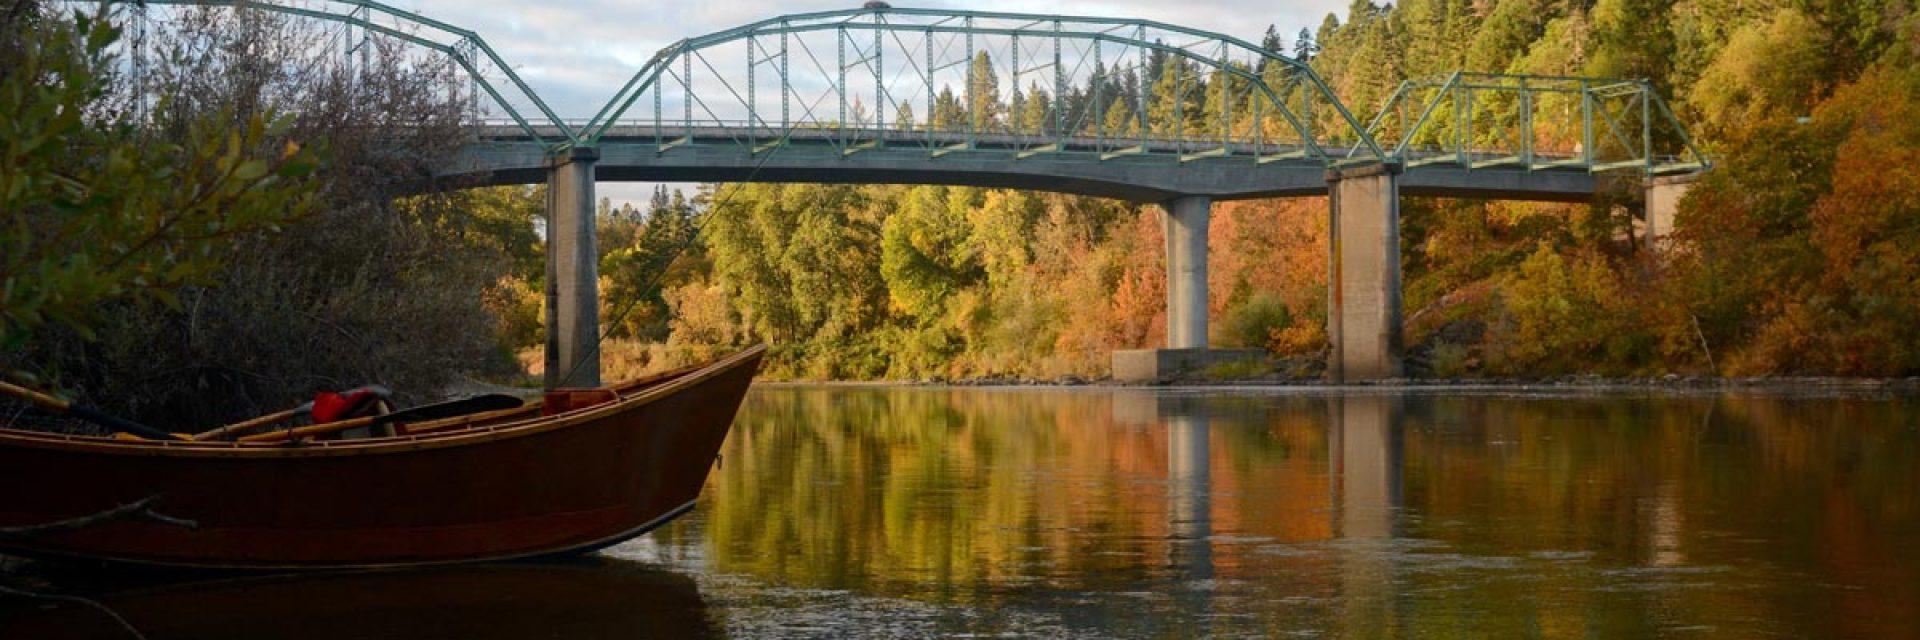 Morrison's Rogue River Fishing